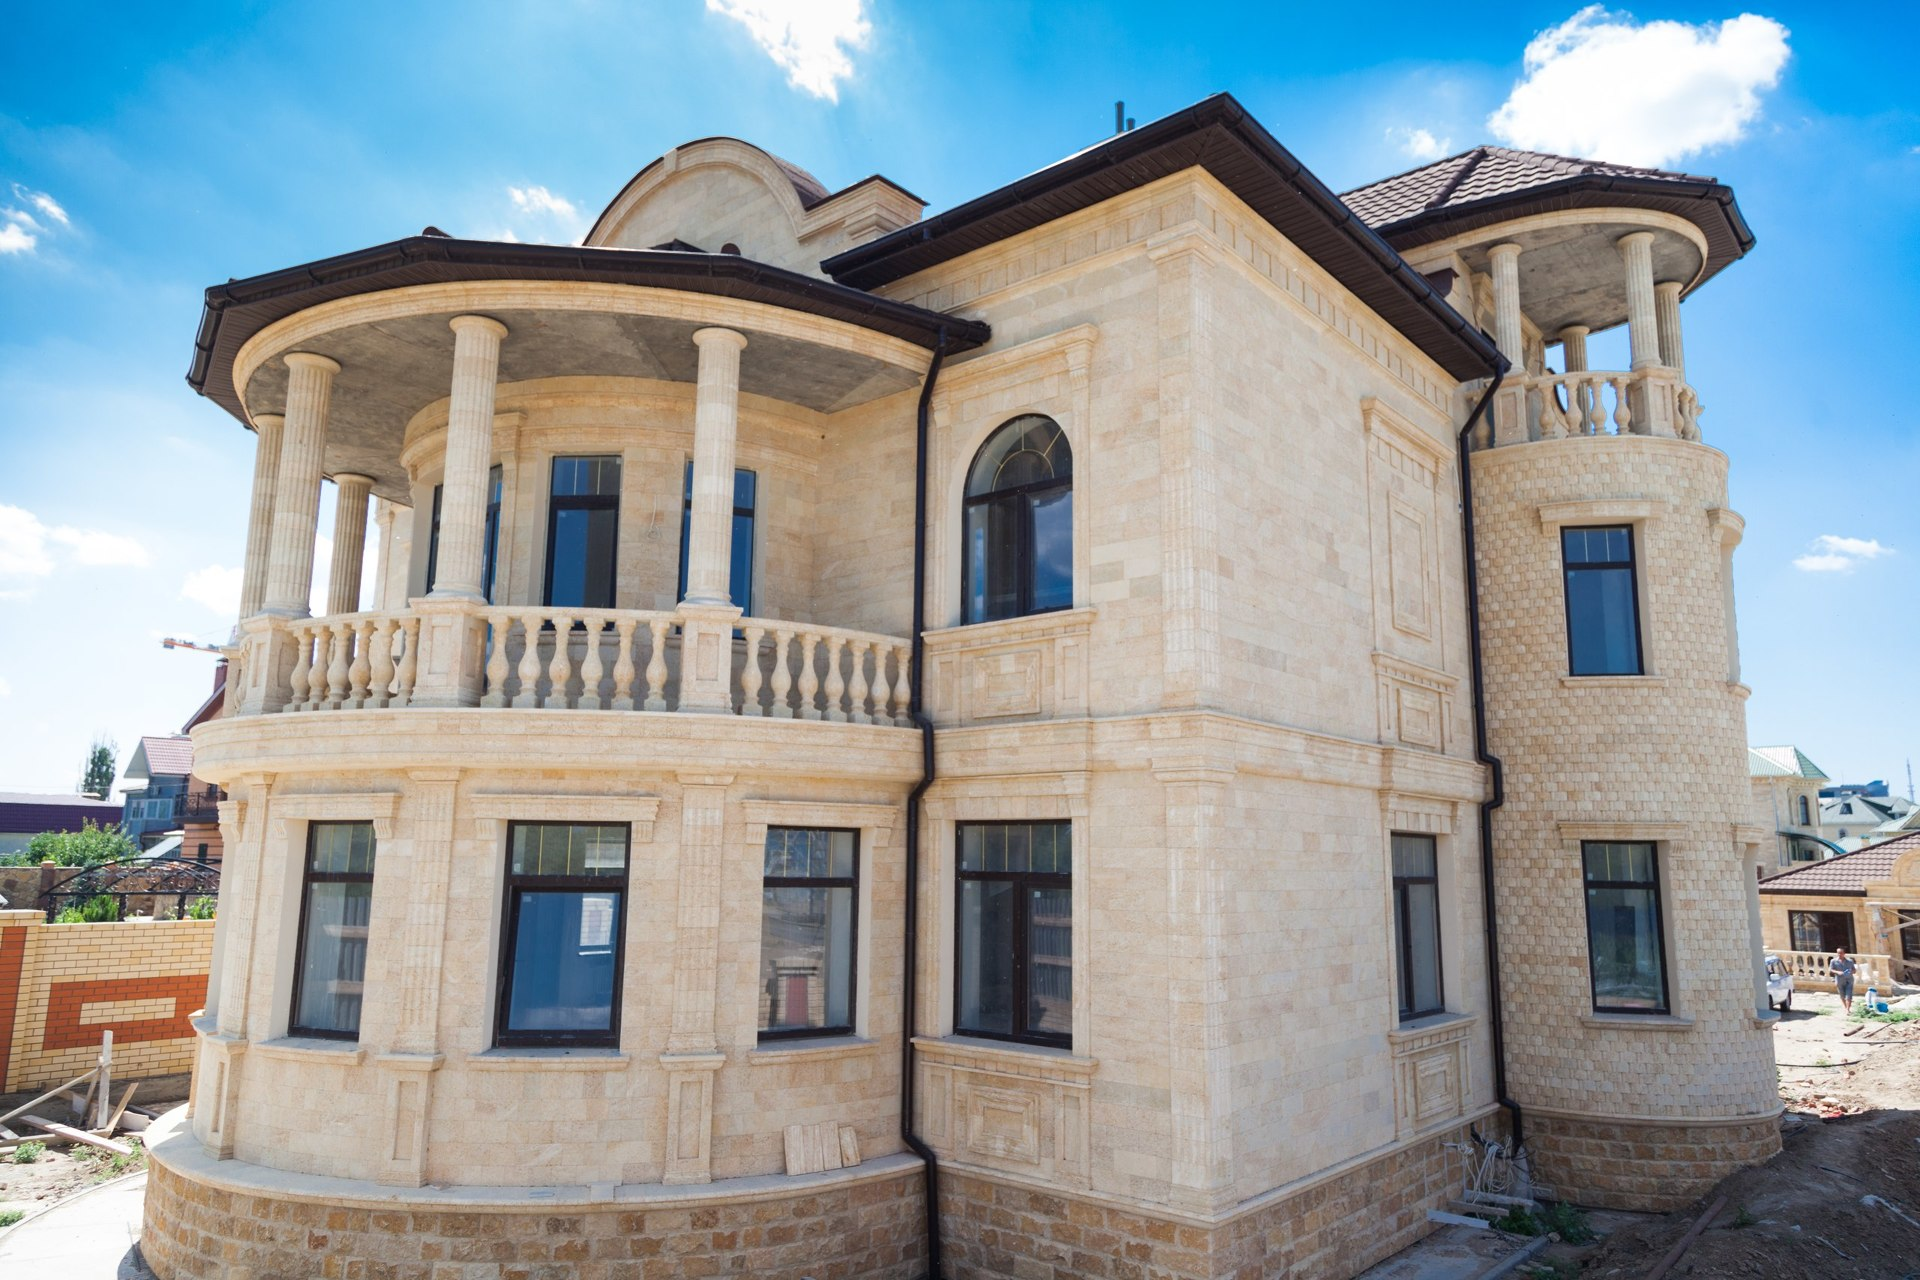 фасад дома из дагестанского камня фото